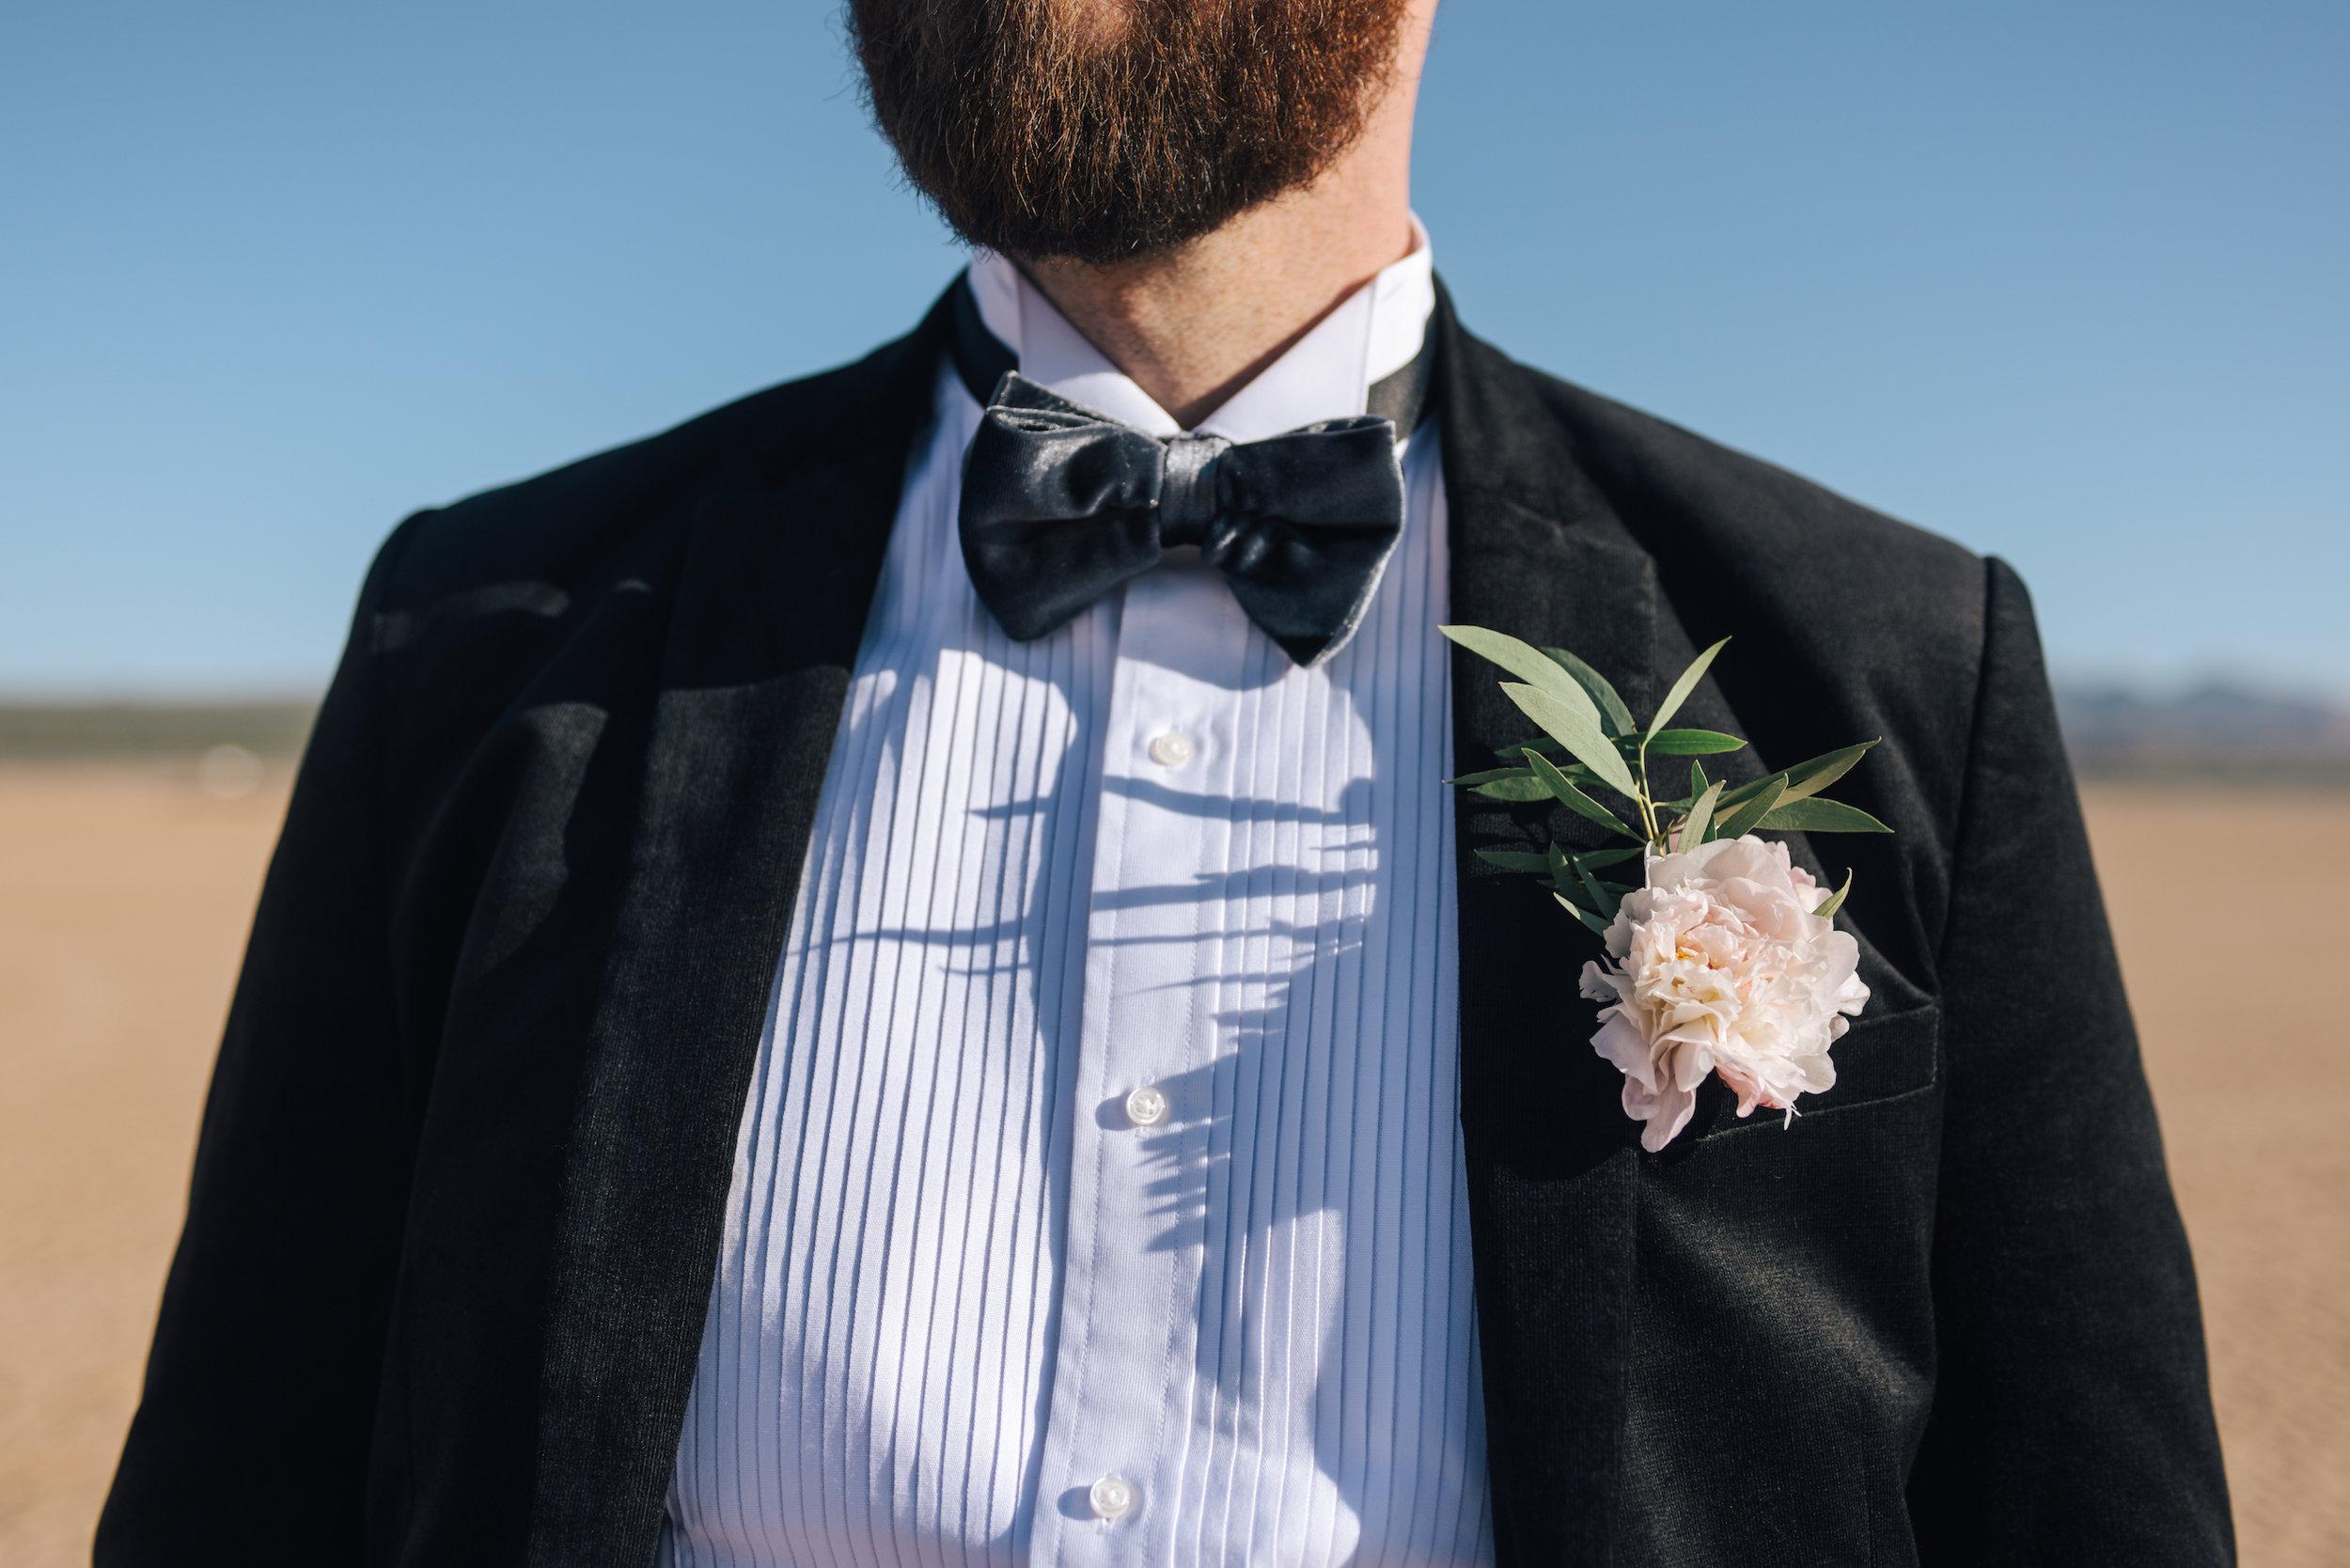 bride and groom, groom, flora pop ceremony, flora pop, bride, las vegas wedding, las vegas elopement, elopement, elope, dry lake bed wedding, lifestyle photography, las vegas, flowers, bridal flowers, wedding dress, wedding, elope